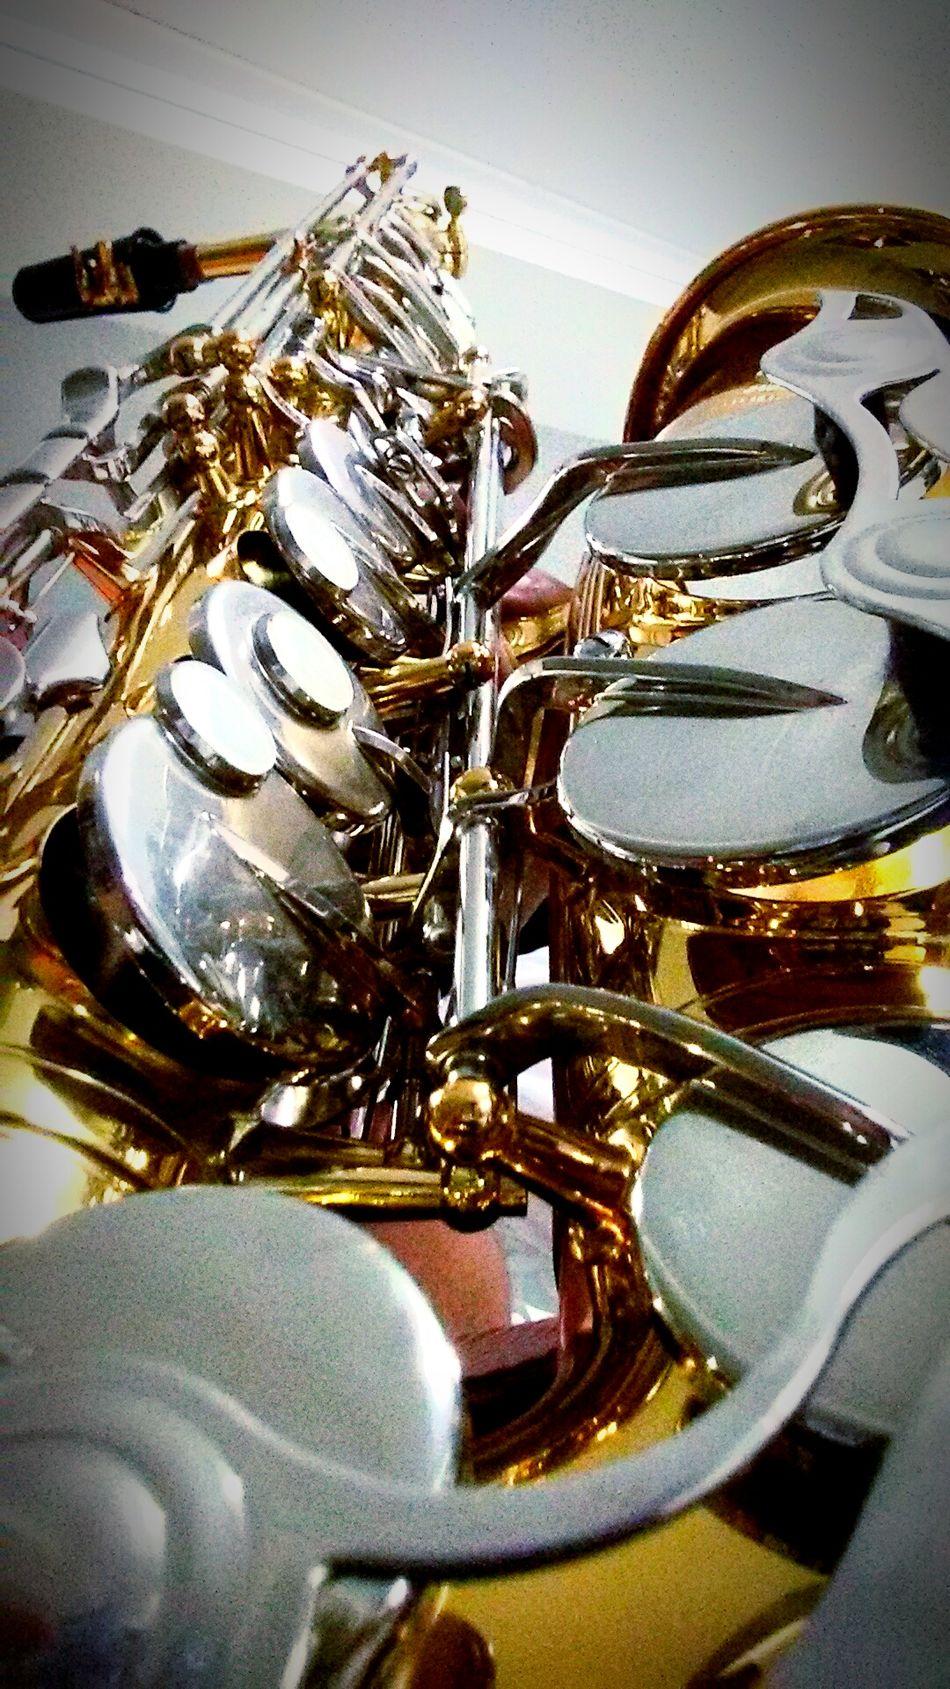 Photografy Saxophone Saxophonist Saxo Pasión  Music Music Is My Life Pasando El Rato Relaxing Acompañamiento Vida